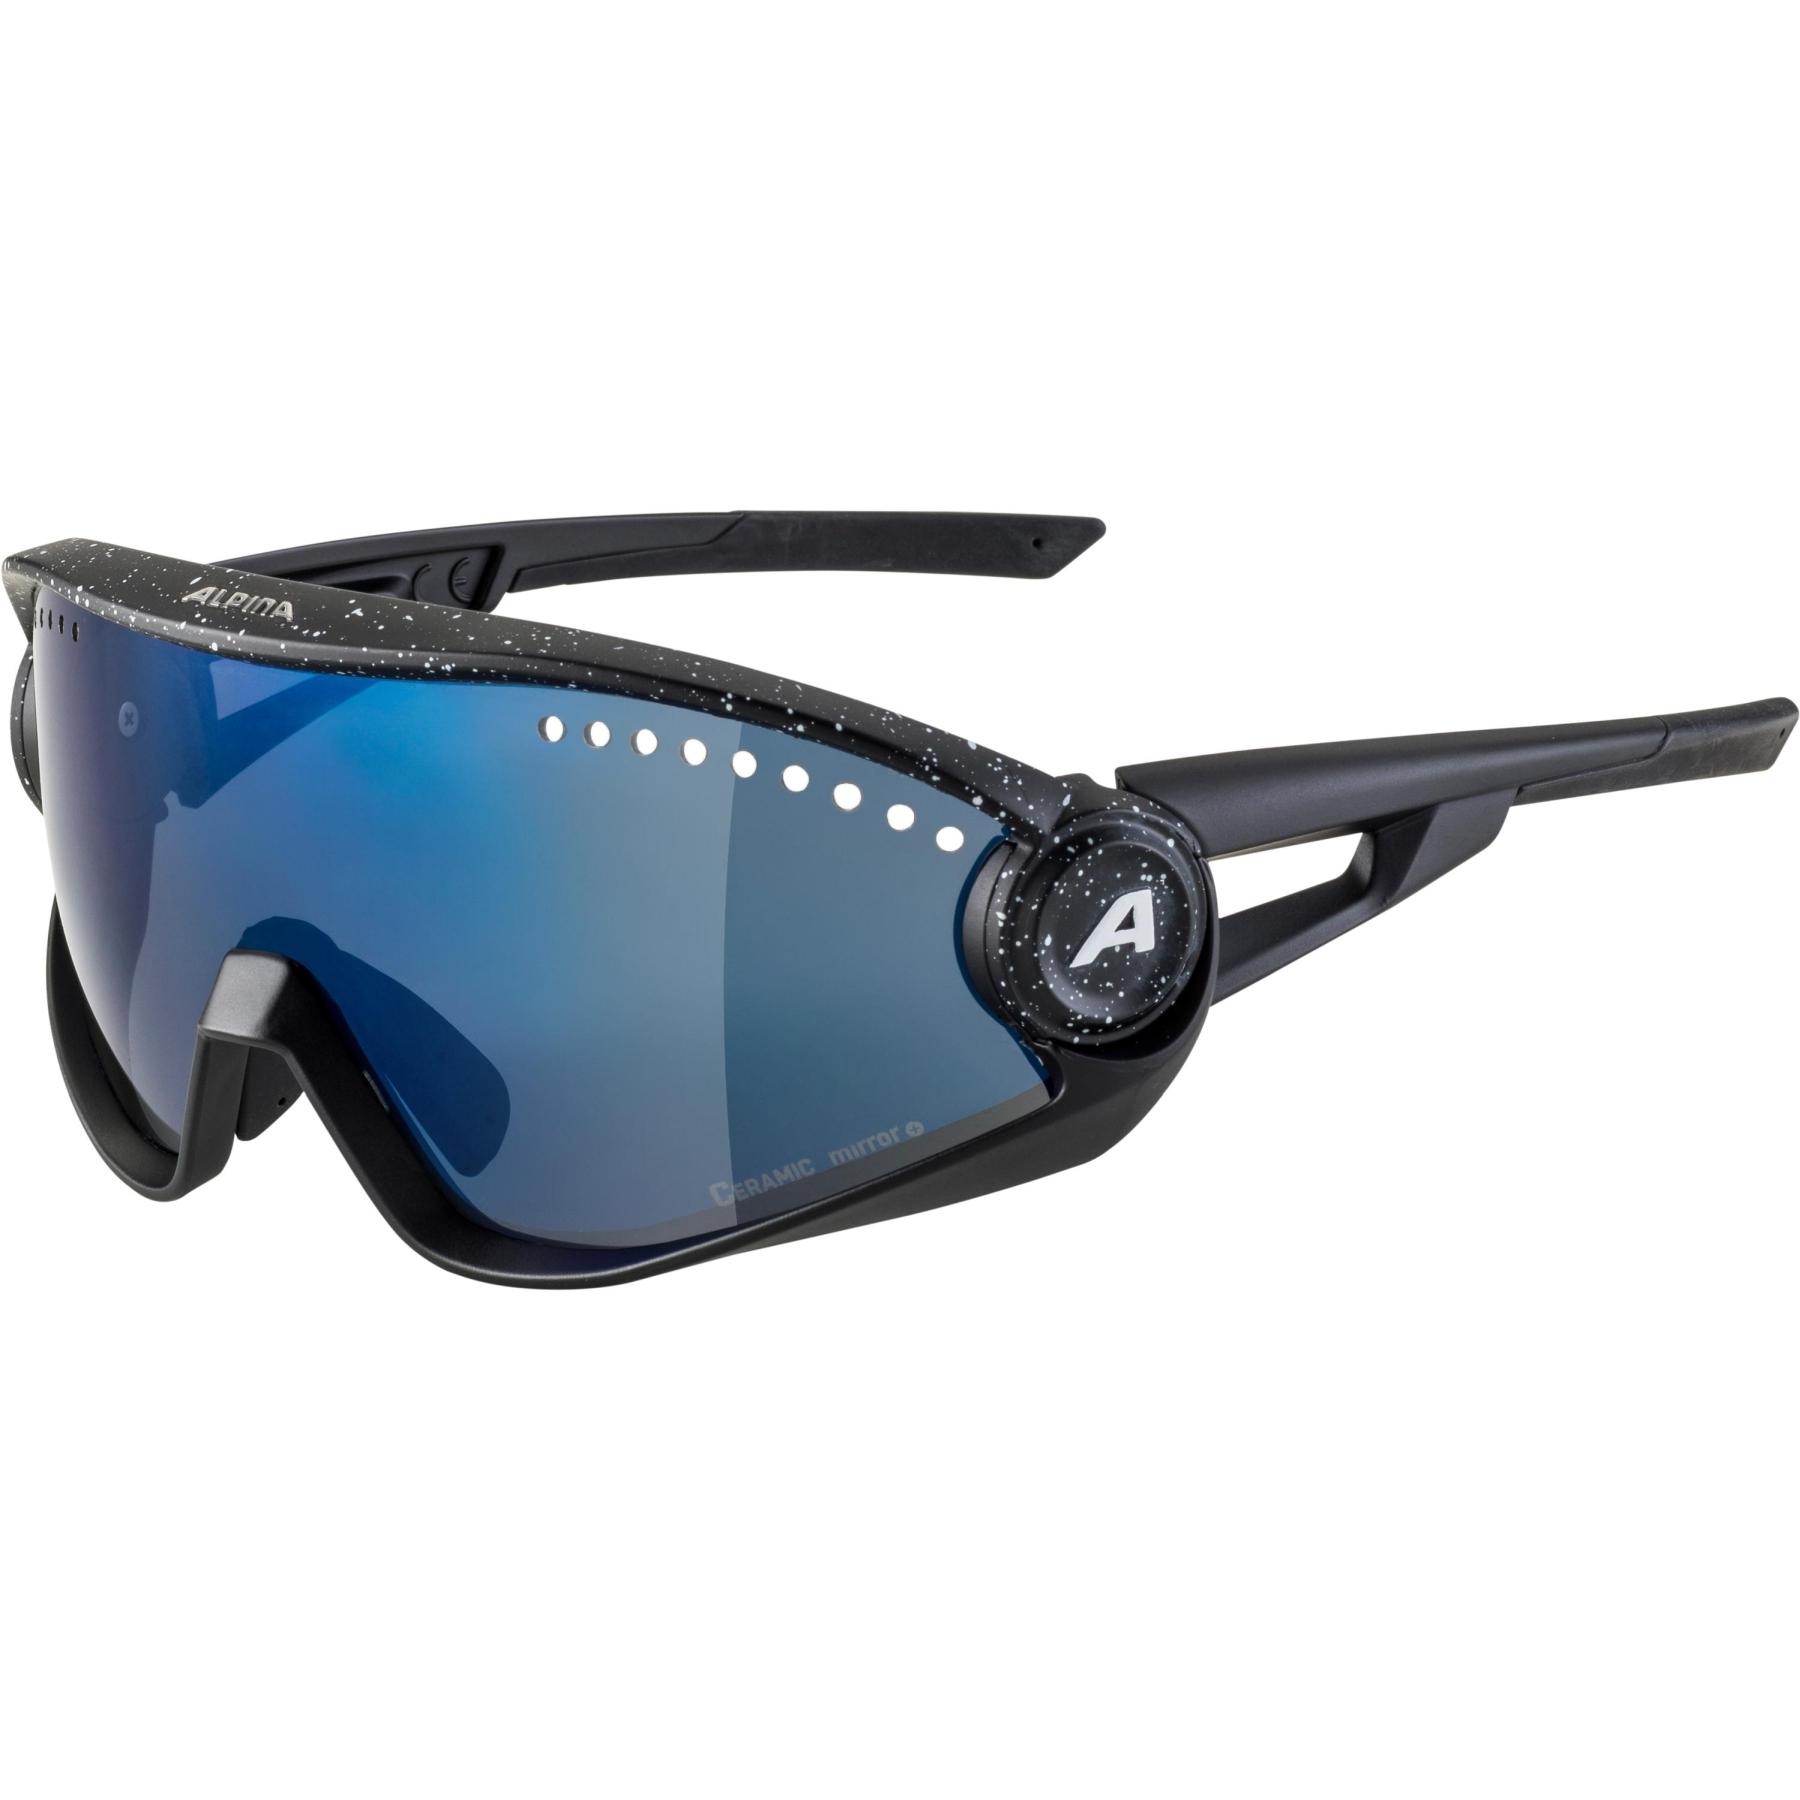 Alpina 5W1NG CM+ Glasses - black blur / blue mirror